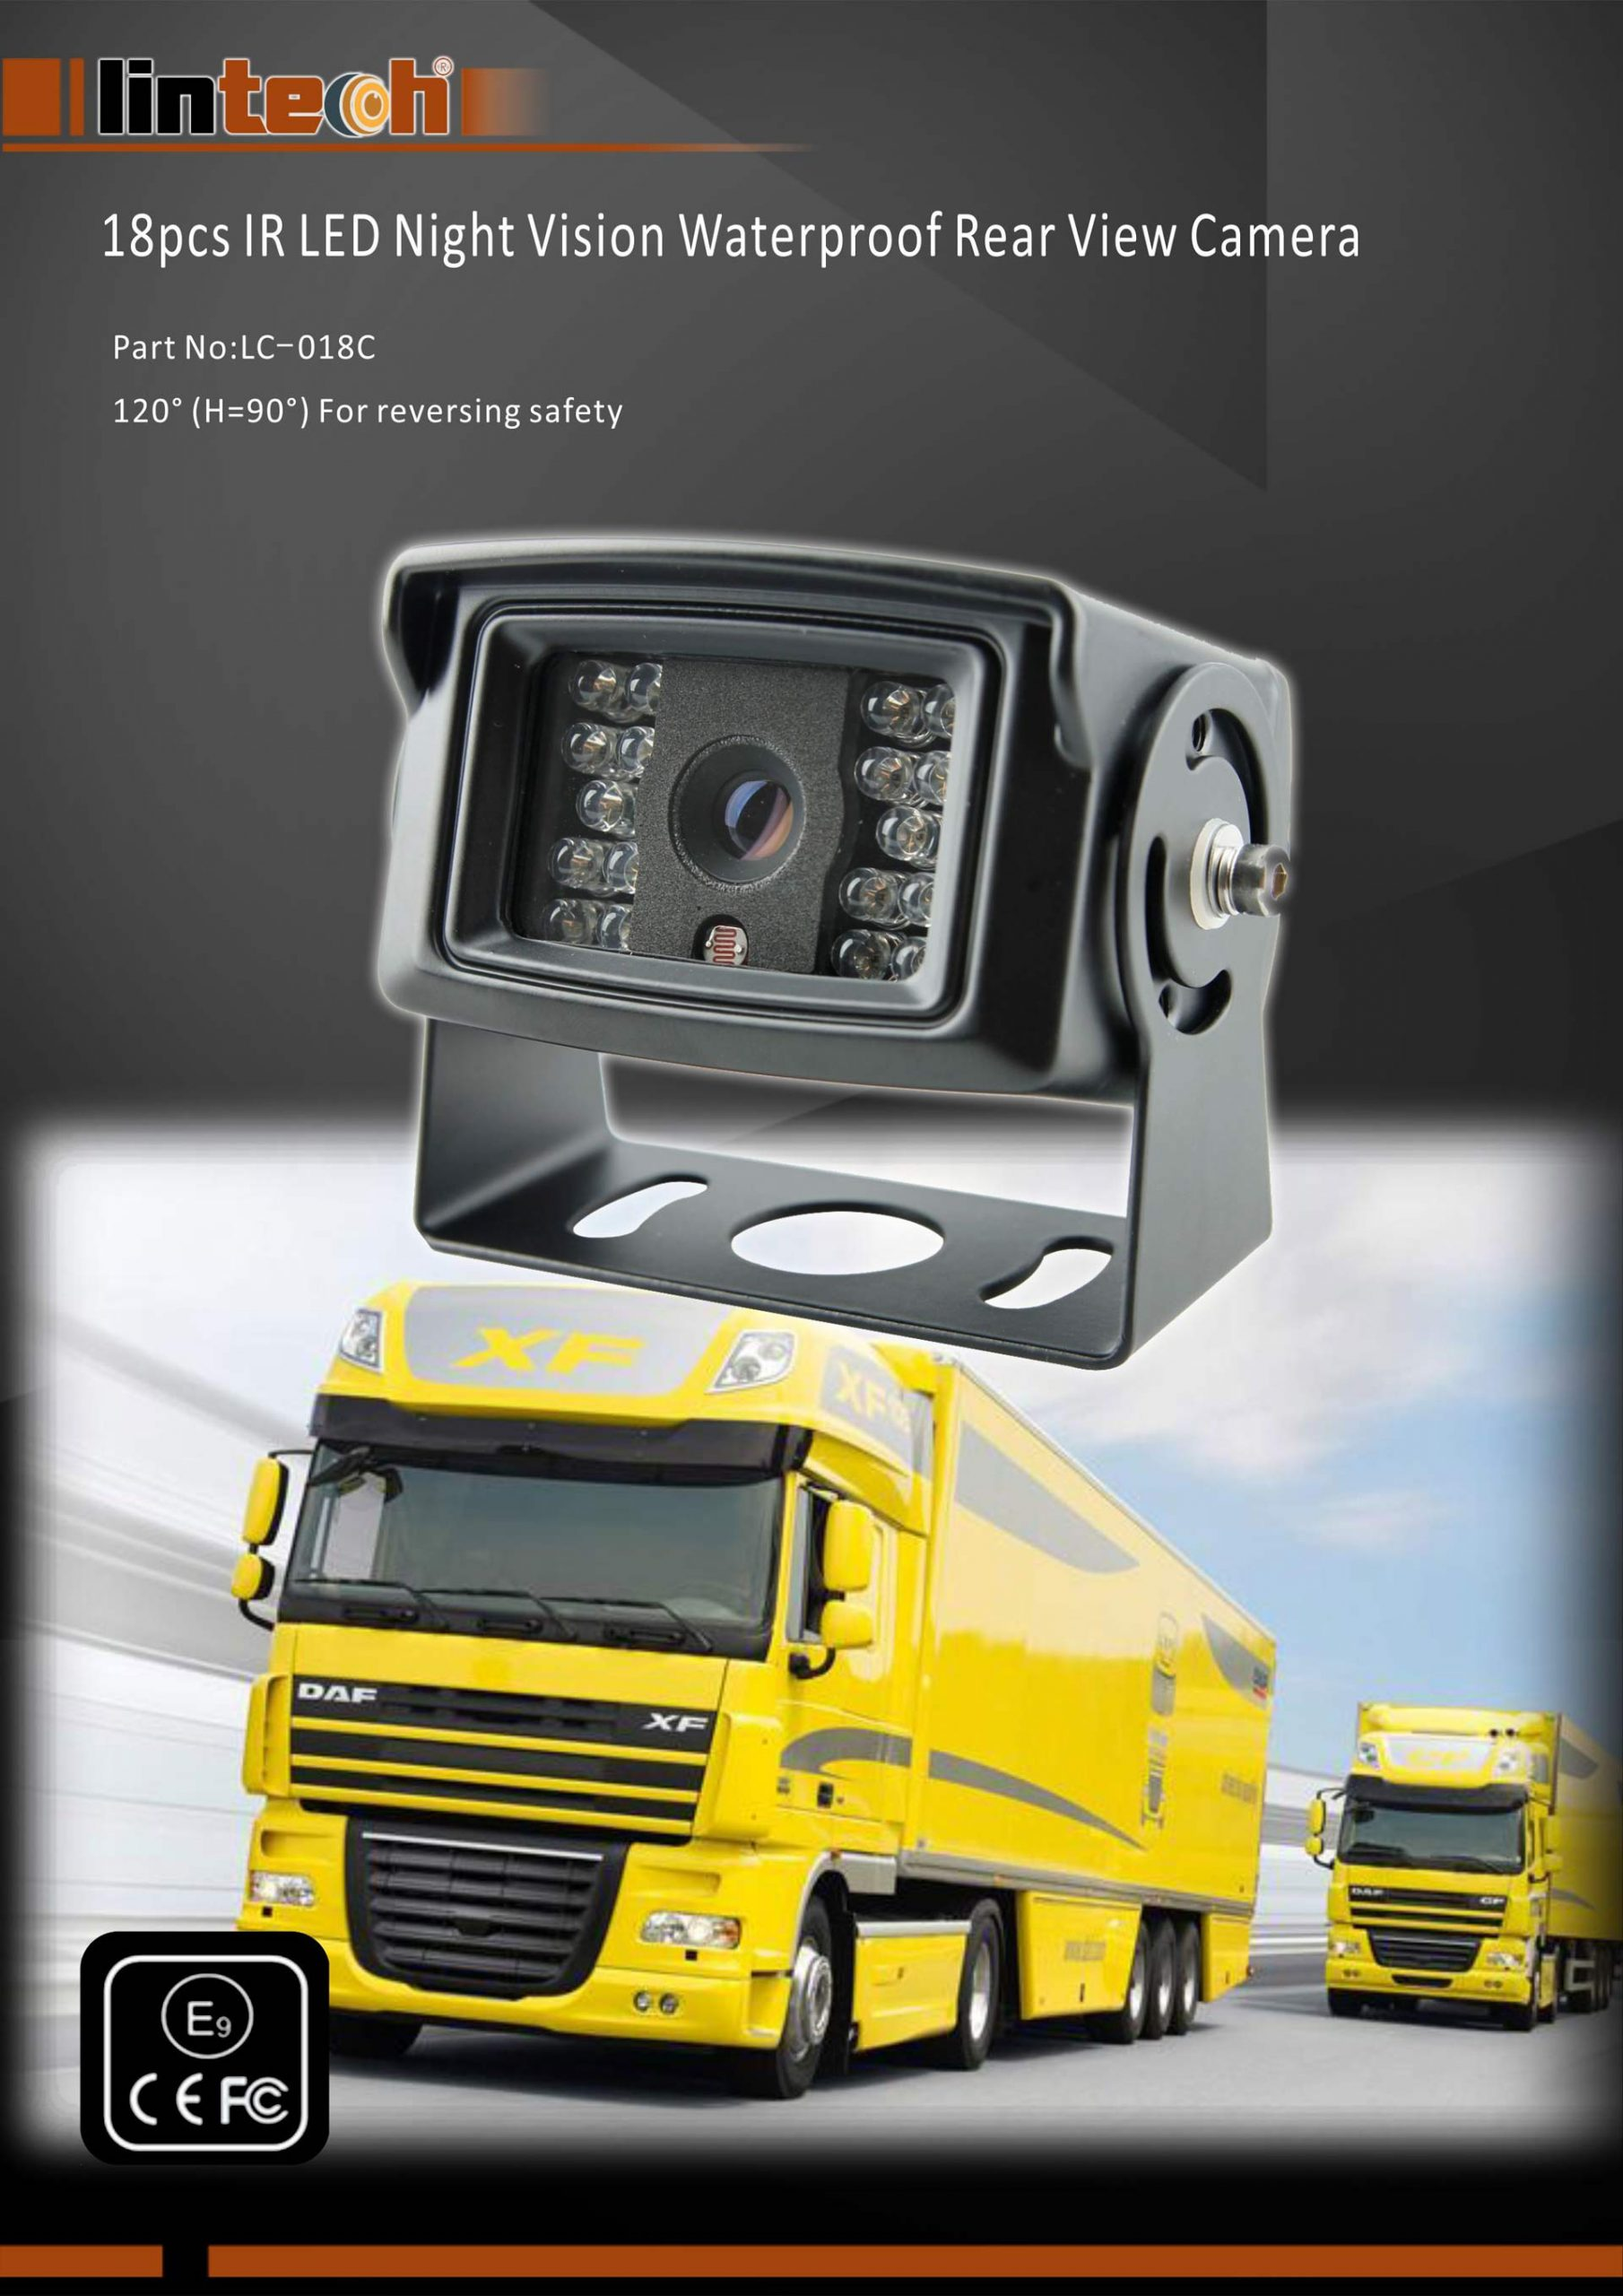 1.18pcs-IR-LED-Night-Vision-Waterproof-Rear-View-Camera